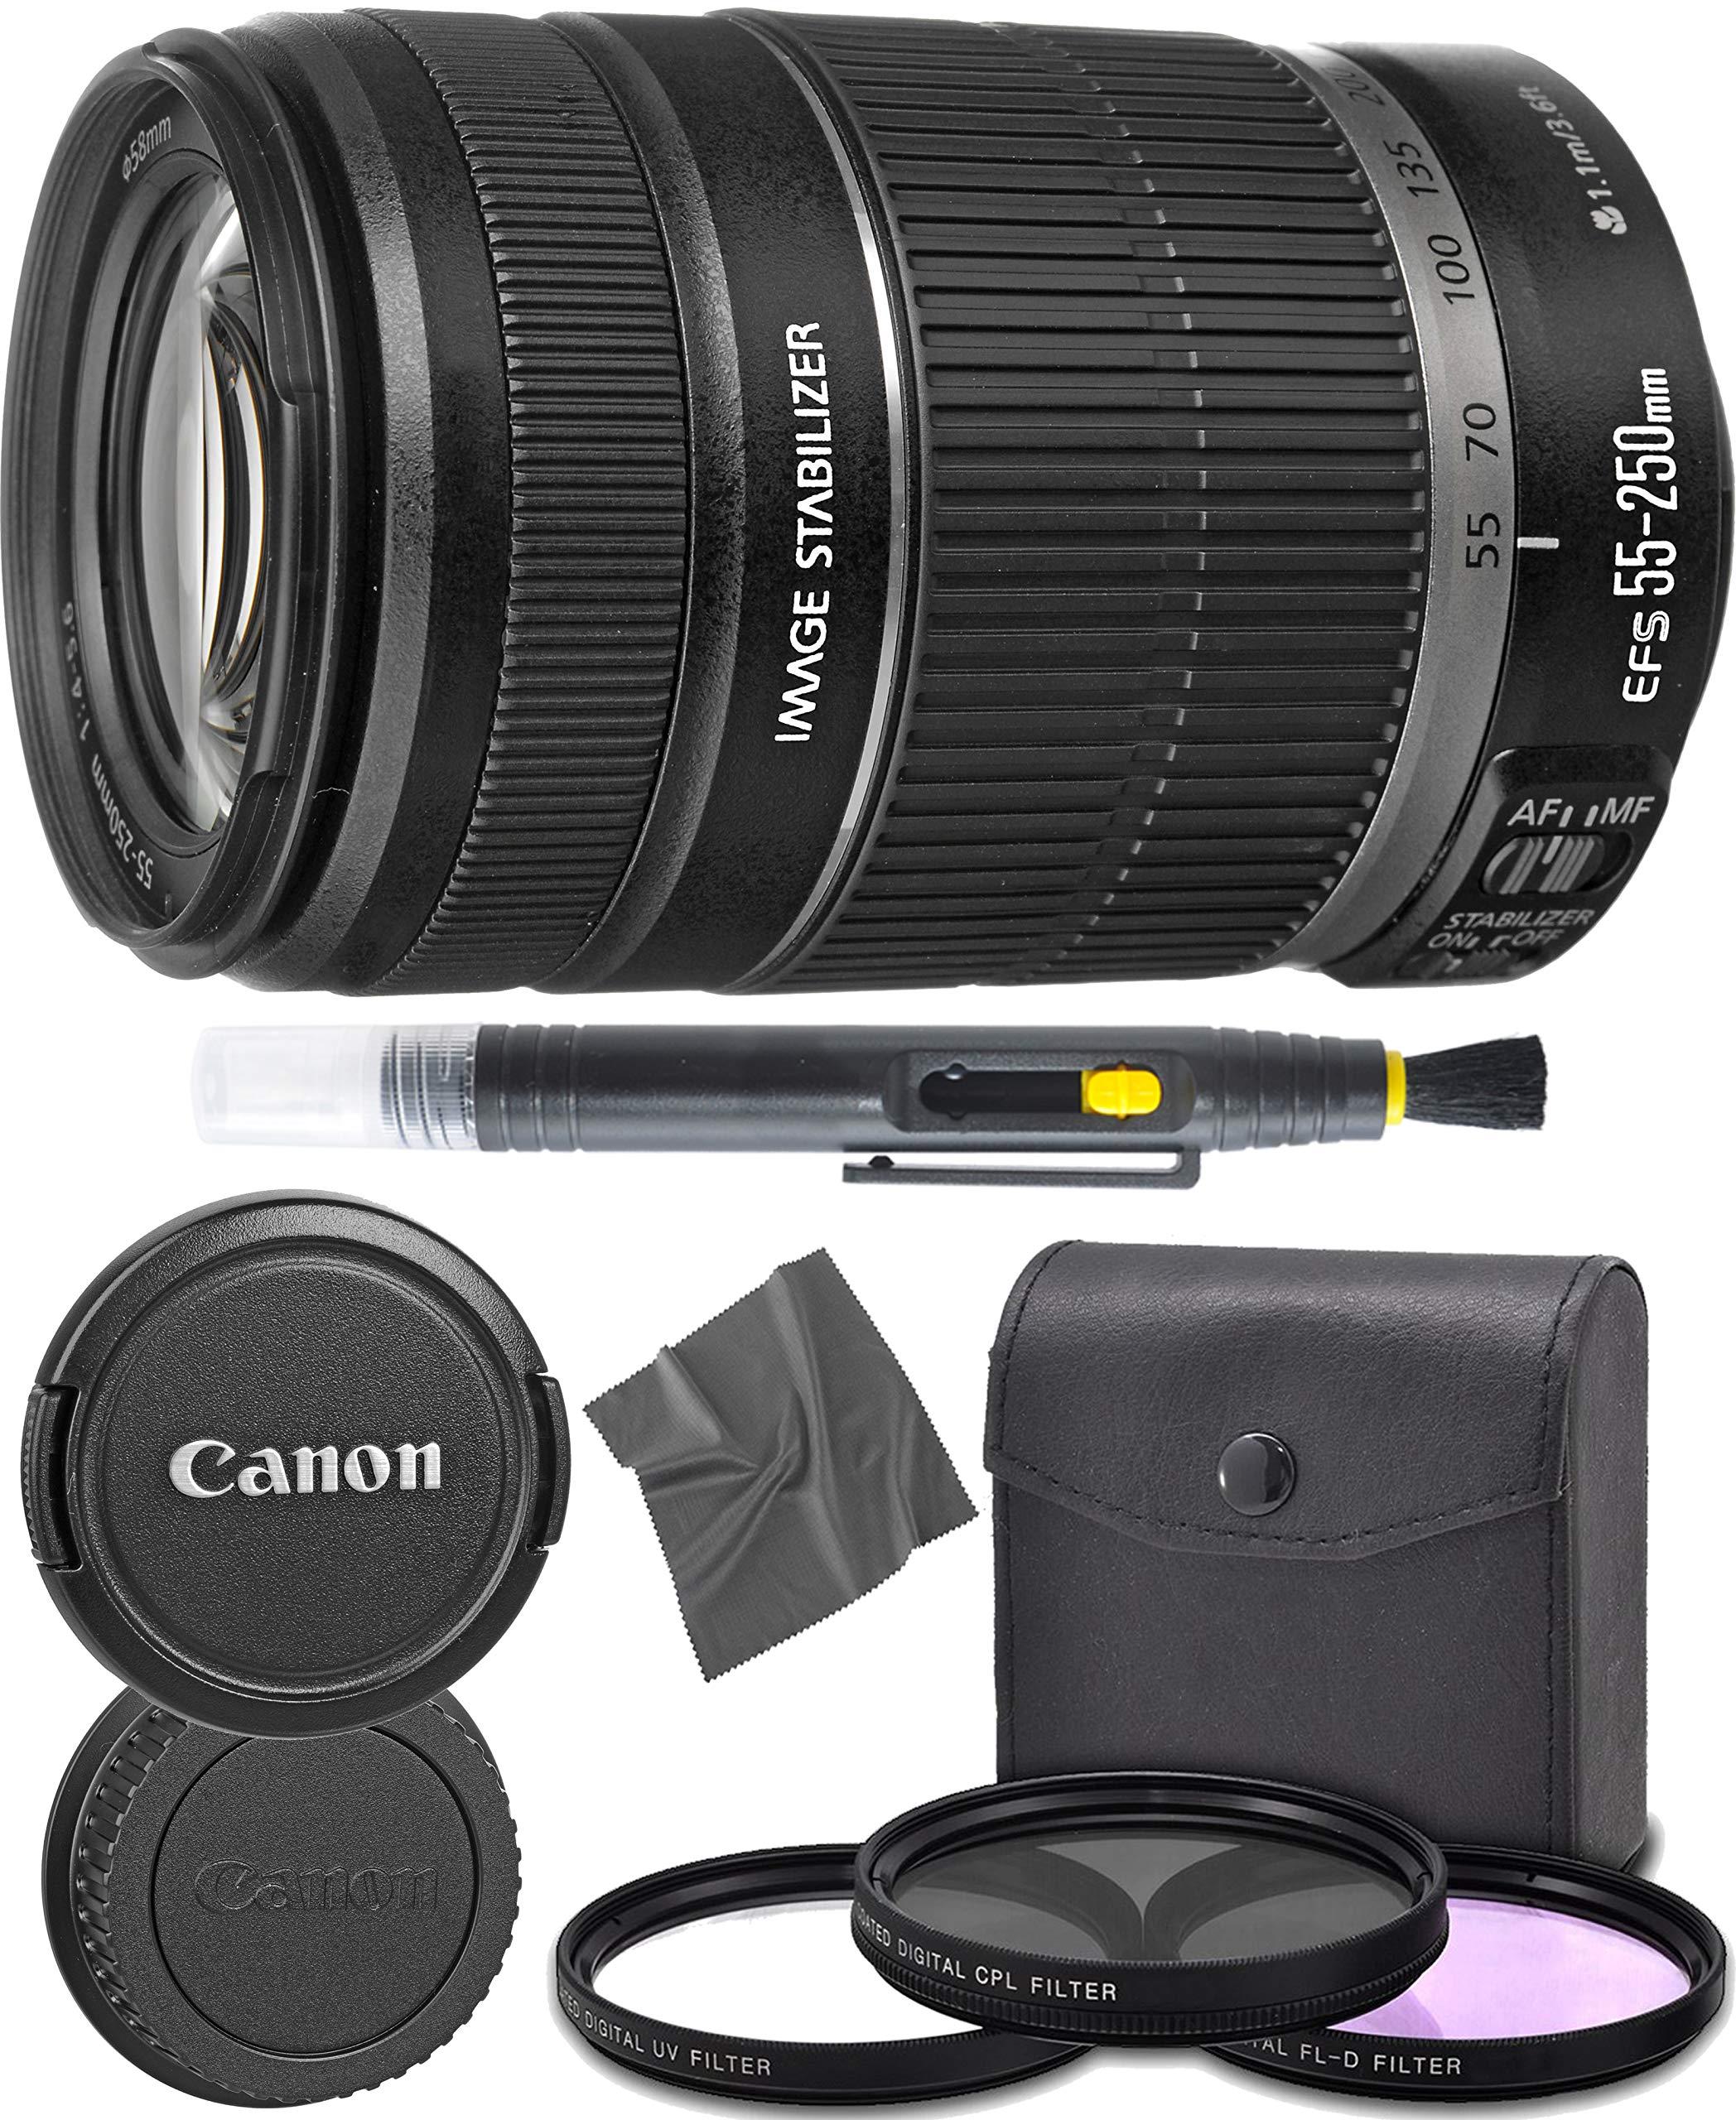 Canon EF-S 55-250mm f/4-5.6 is II Lens (5123B006) + AOM Pro Starter Bundle Kit - International Version (1 Year AOM Warranty) by AOM